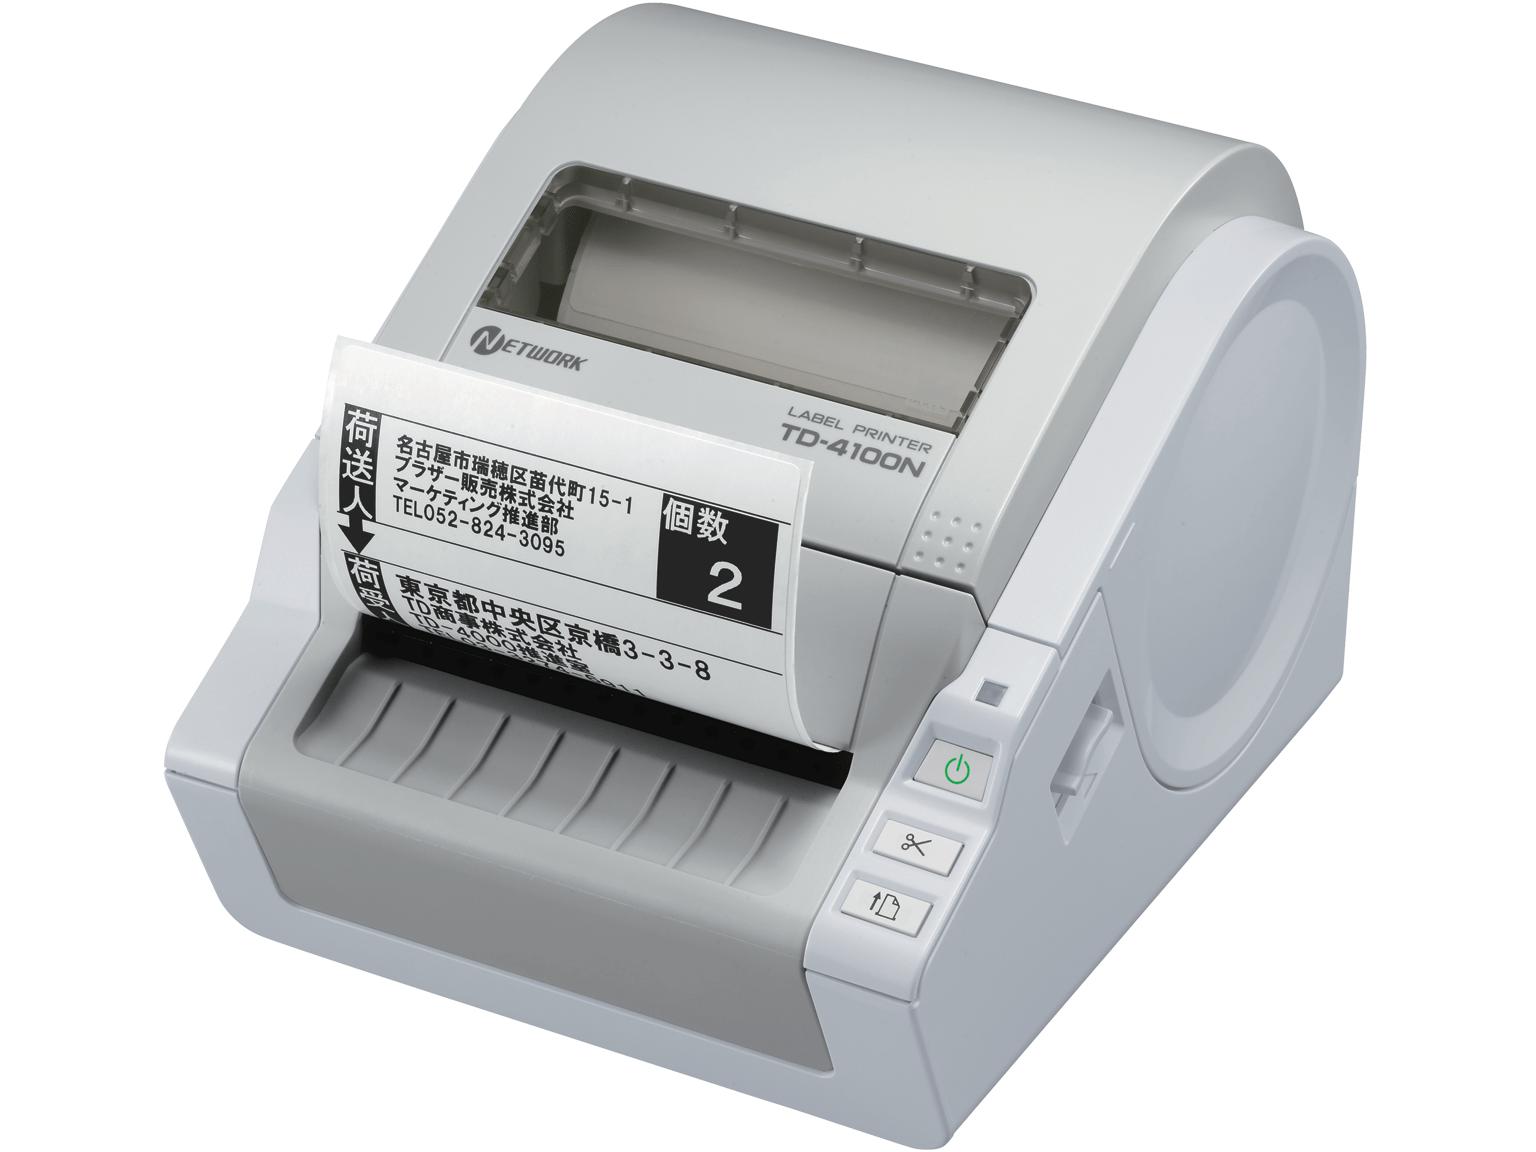 Brother TD-4100N stampante per etichette industriale